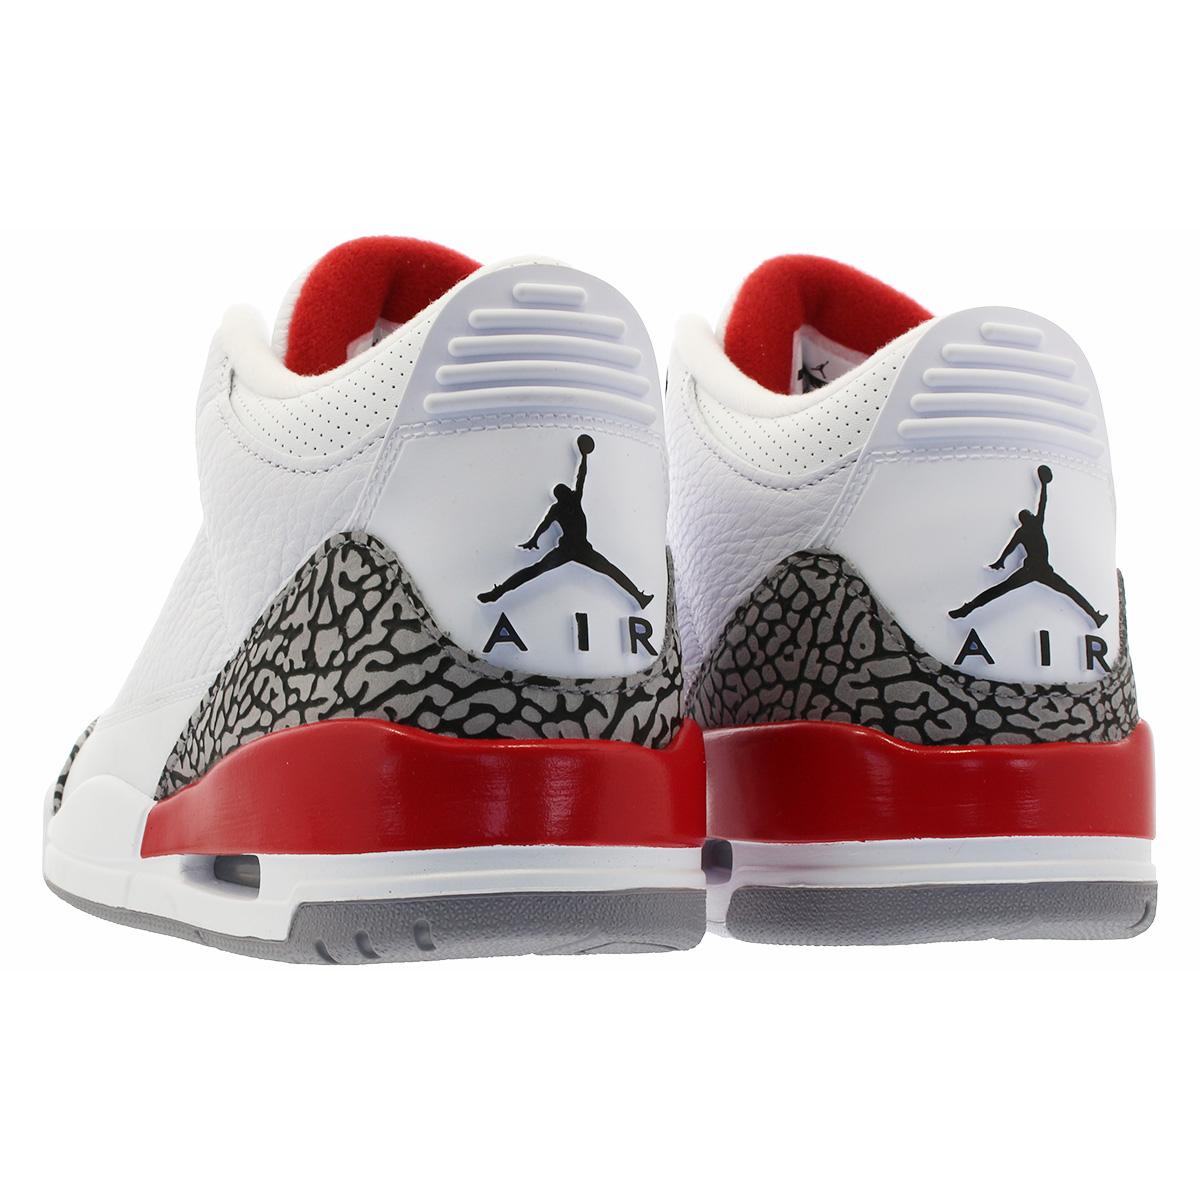 866d7b45ad6 ... NIKE AIR JORDAN 3 RETRO Nike Air Jordan 3 nostalgic WHITE/CEMENT GREY/ FIRE ...